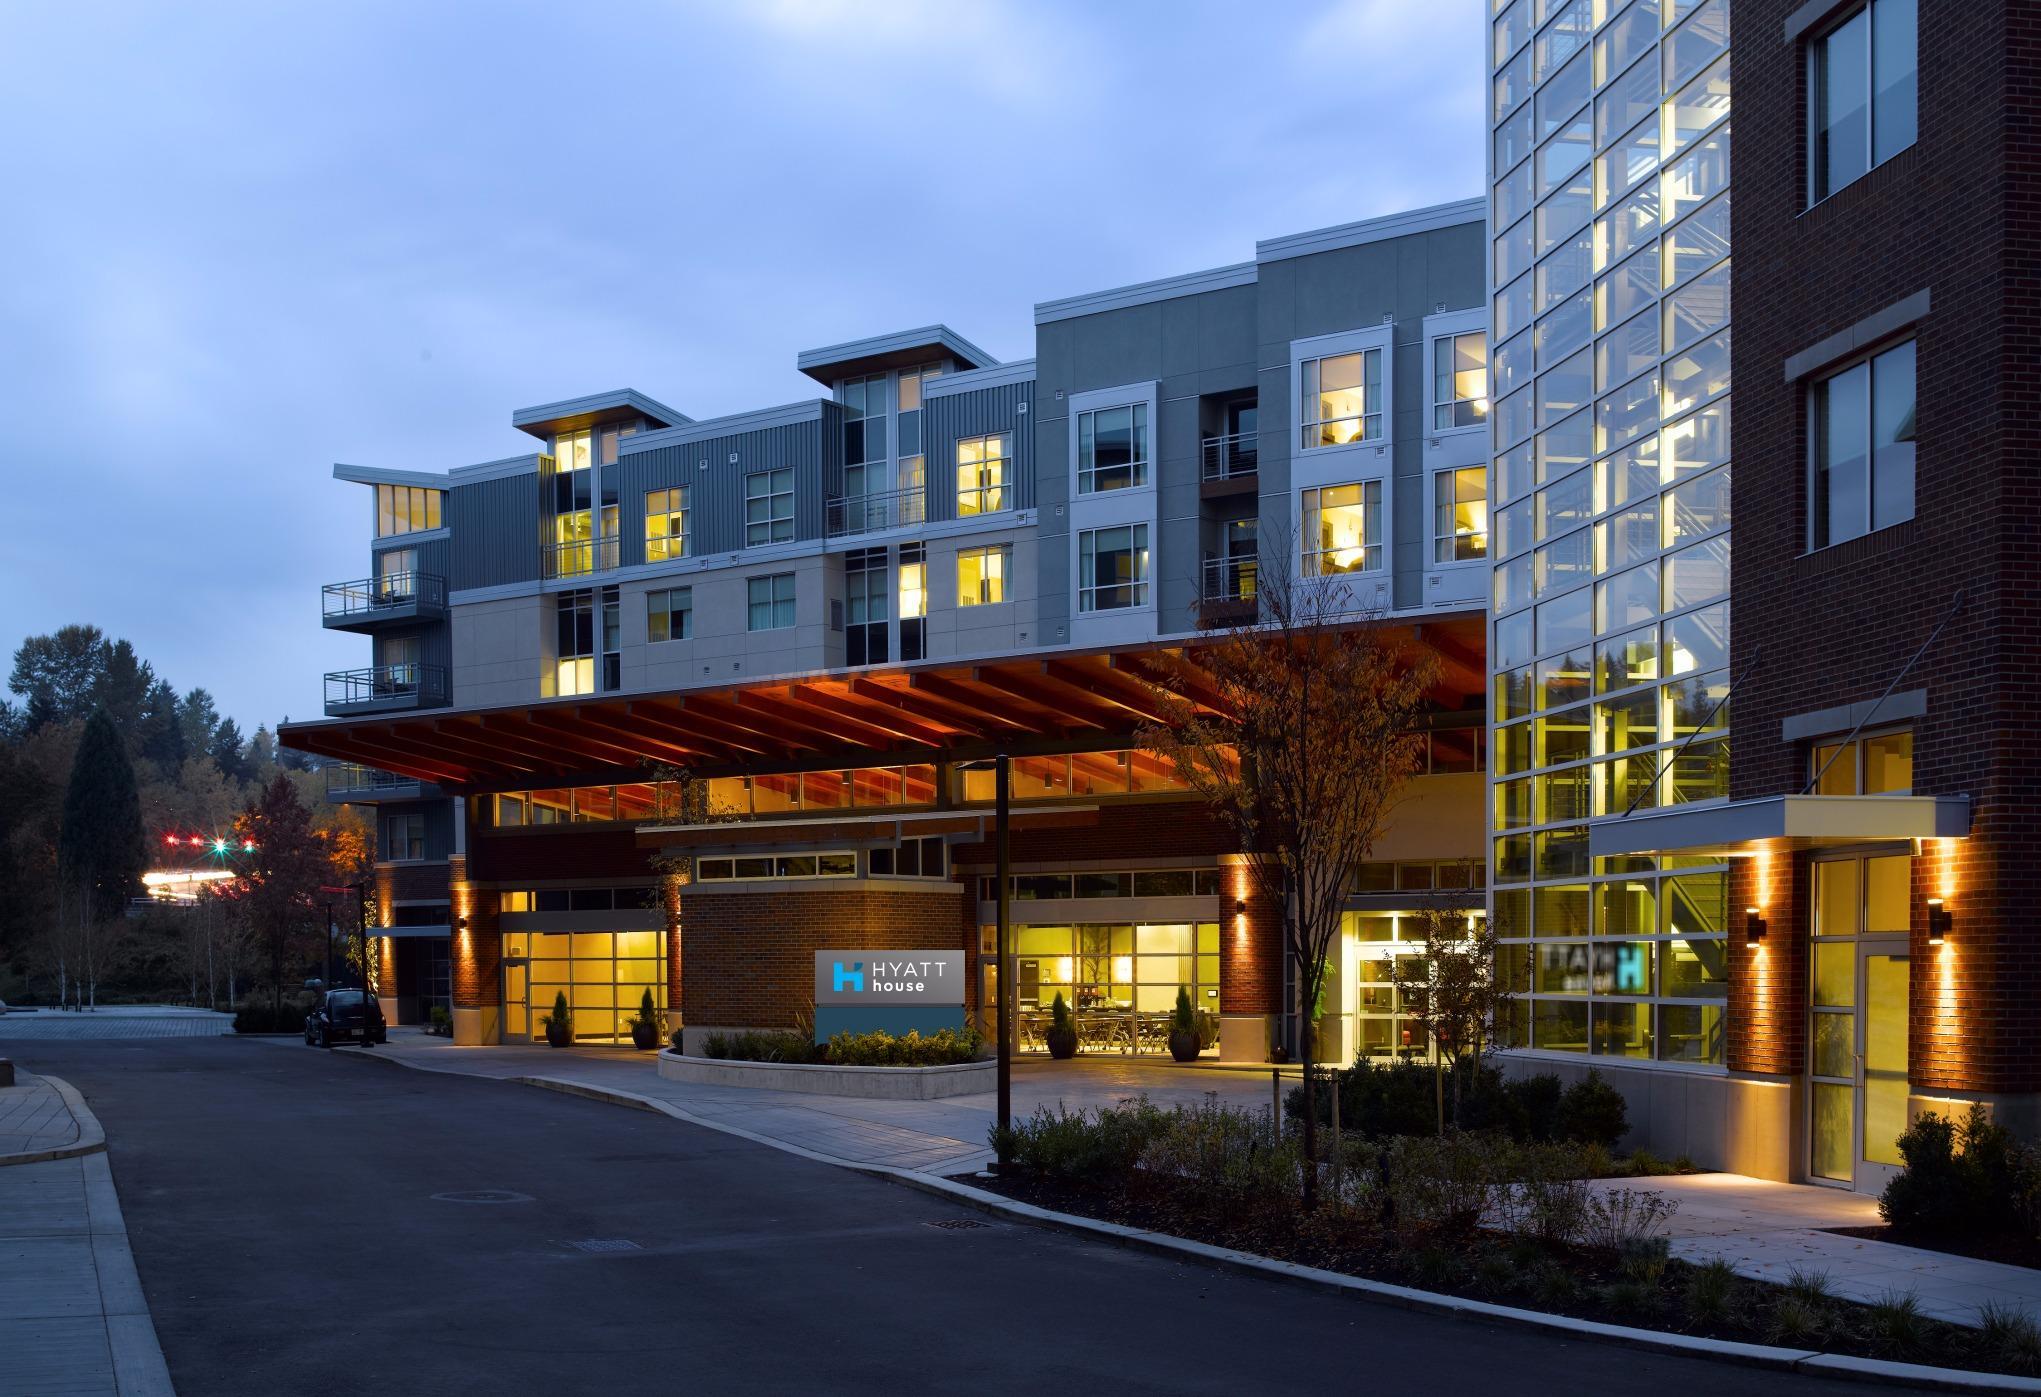 Hyatt House Seattle/Redmond image 0